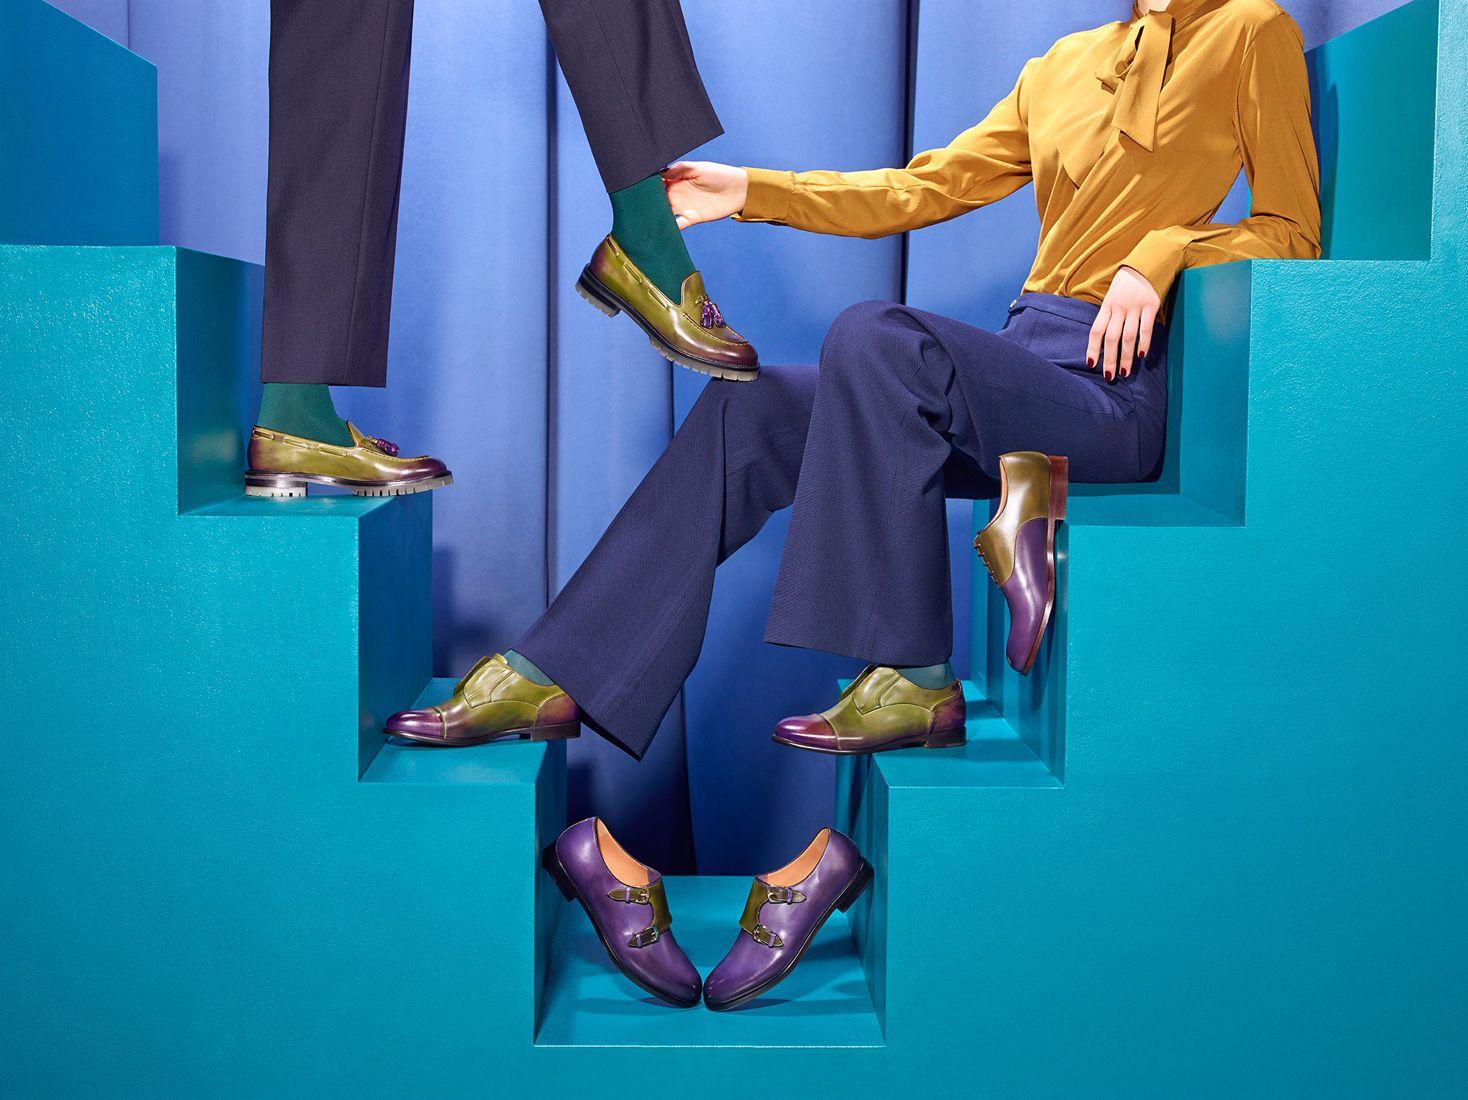 c06adb9c6ba Collection Woman Fall Winter 2015 - Fratelli Rossetti | Shoes | Fall ...